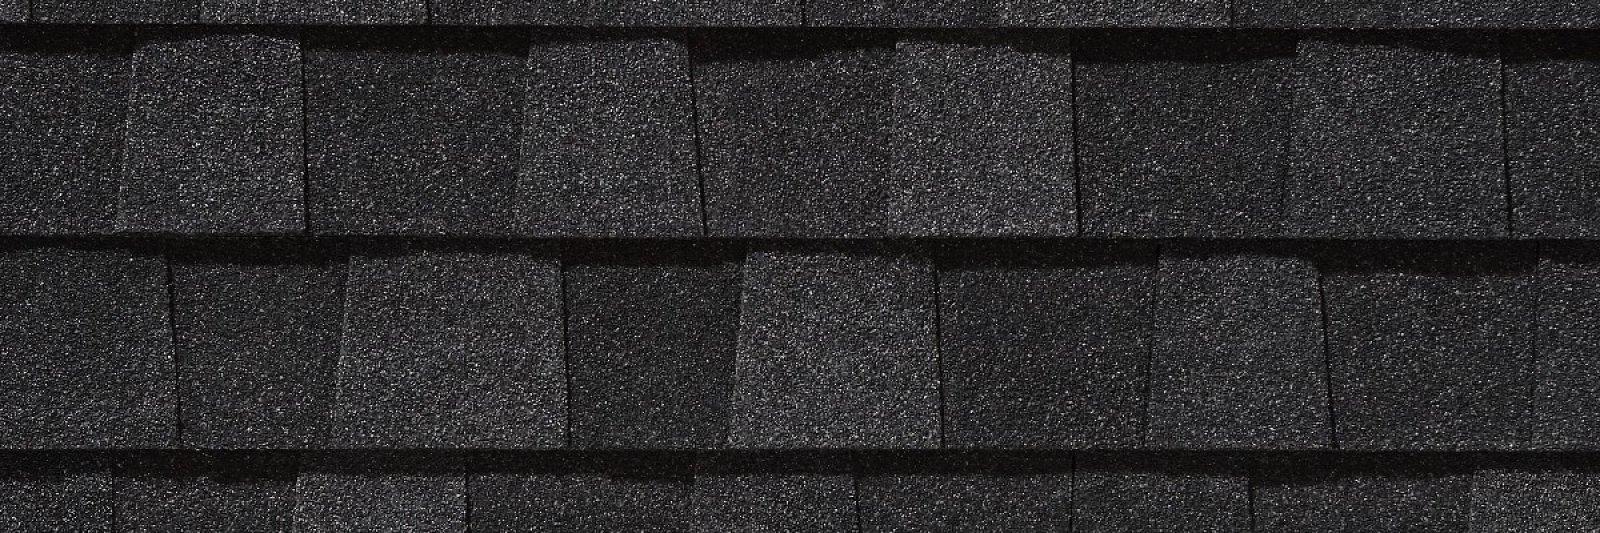 Charcoal Black image